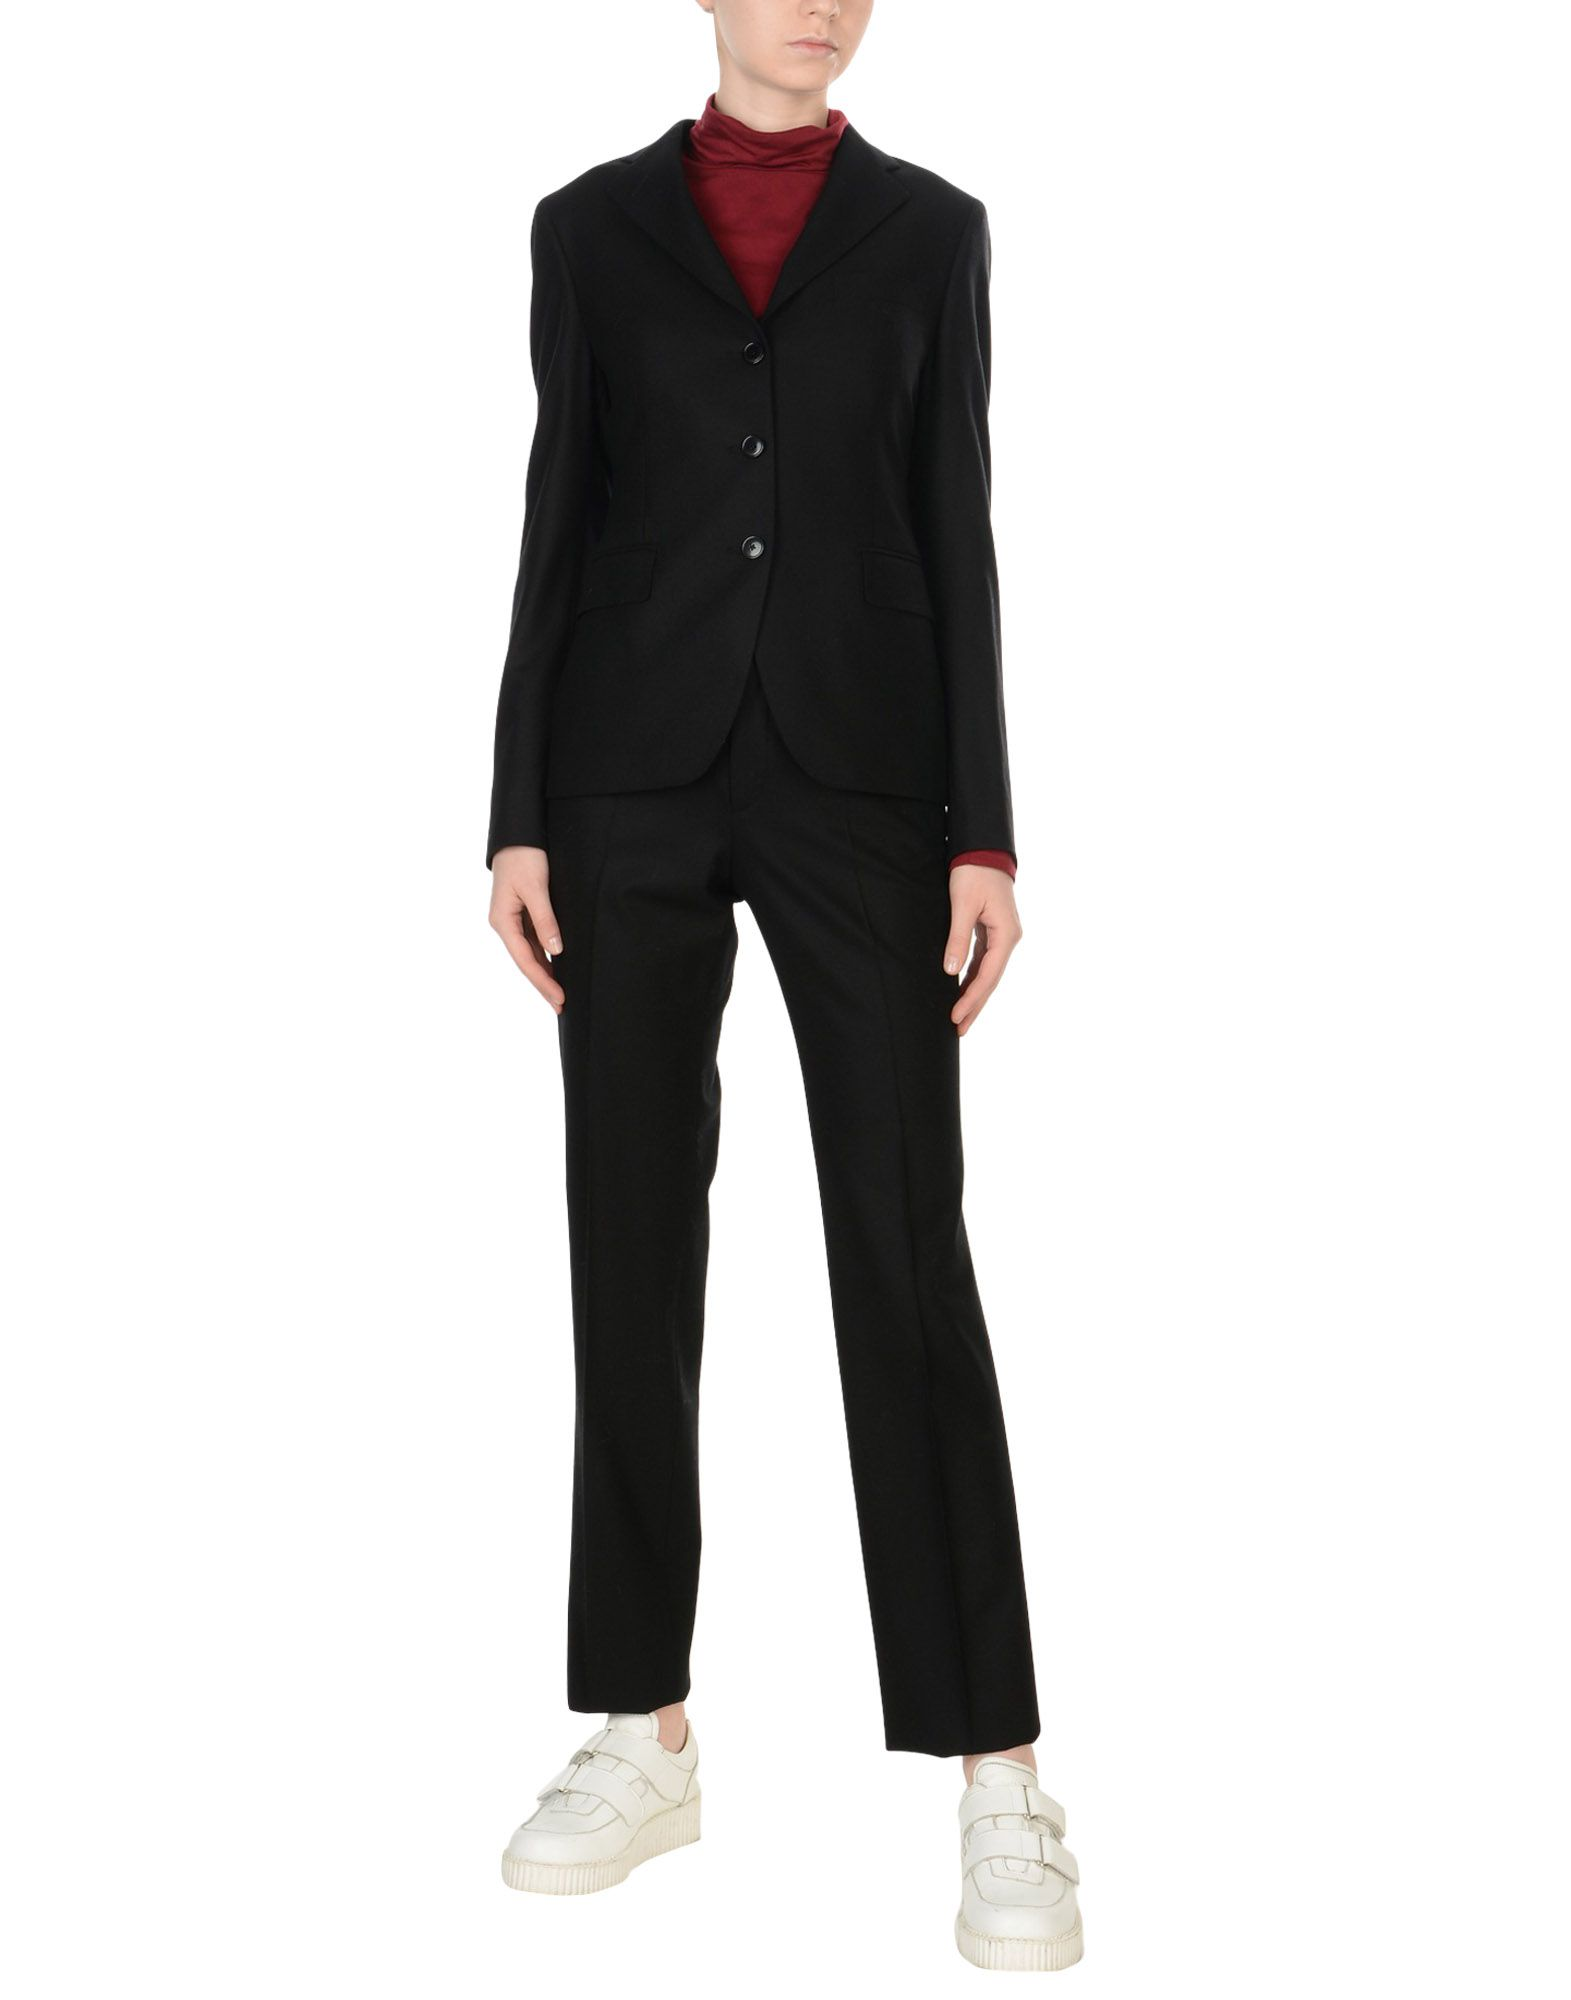 a8bfdb7d83b8 Yoox - Γυναικεία Ταγιέρ - Σελίδα 13 | Outfit.gr